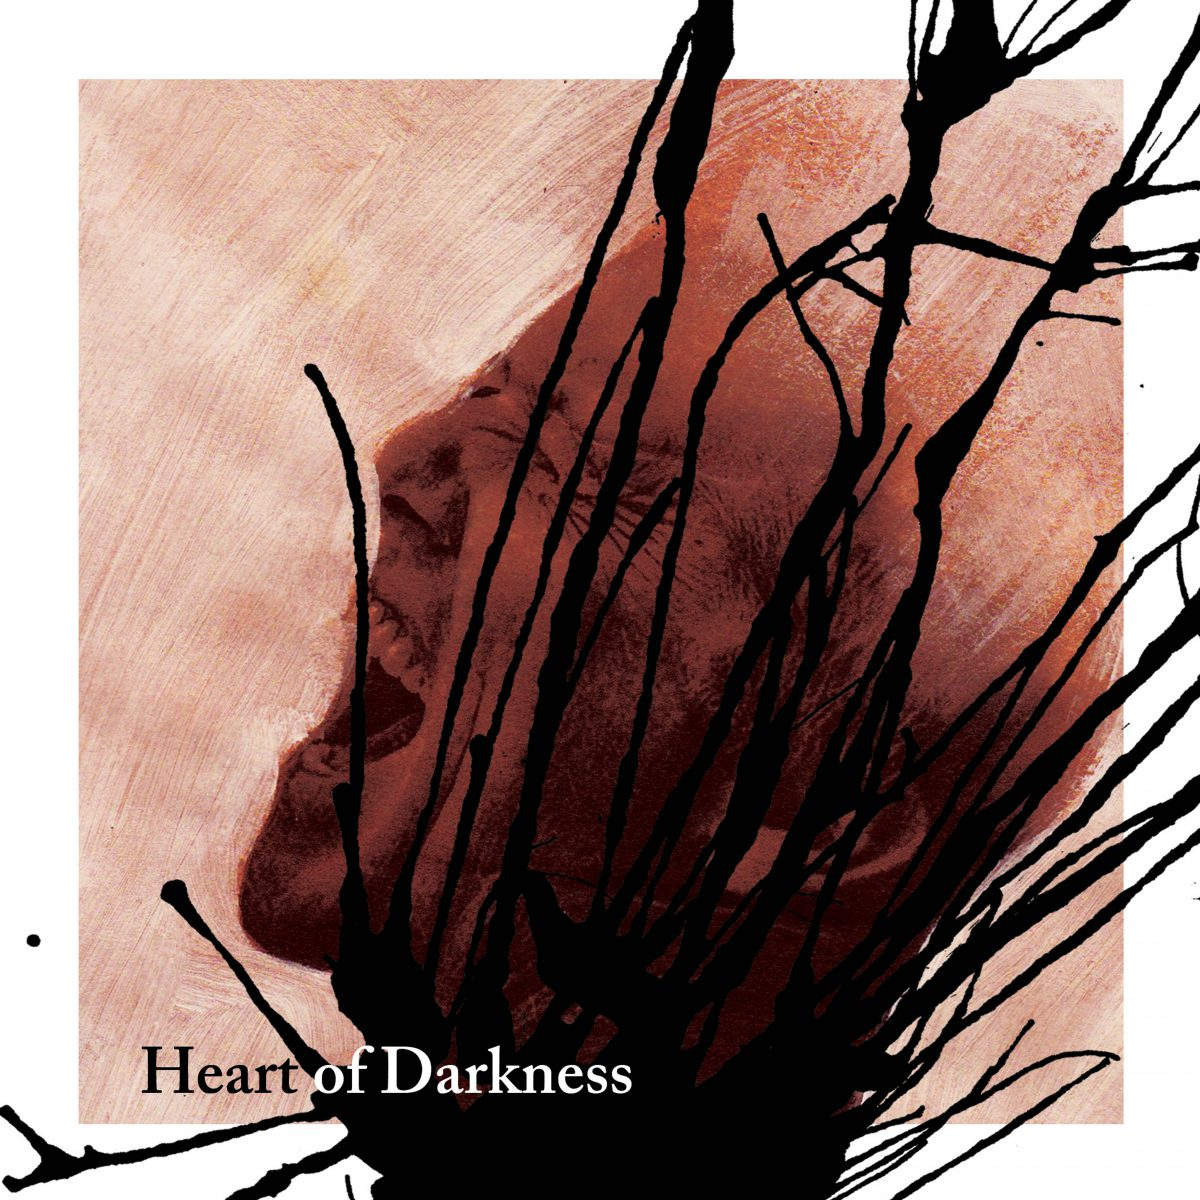 Heart of Darkness - Pesto - Pierre Estoppey - Illustrateur